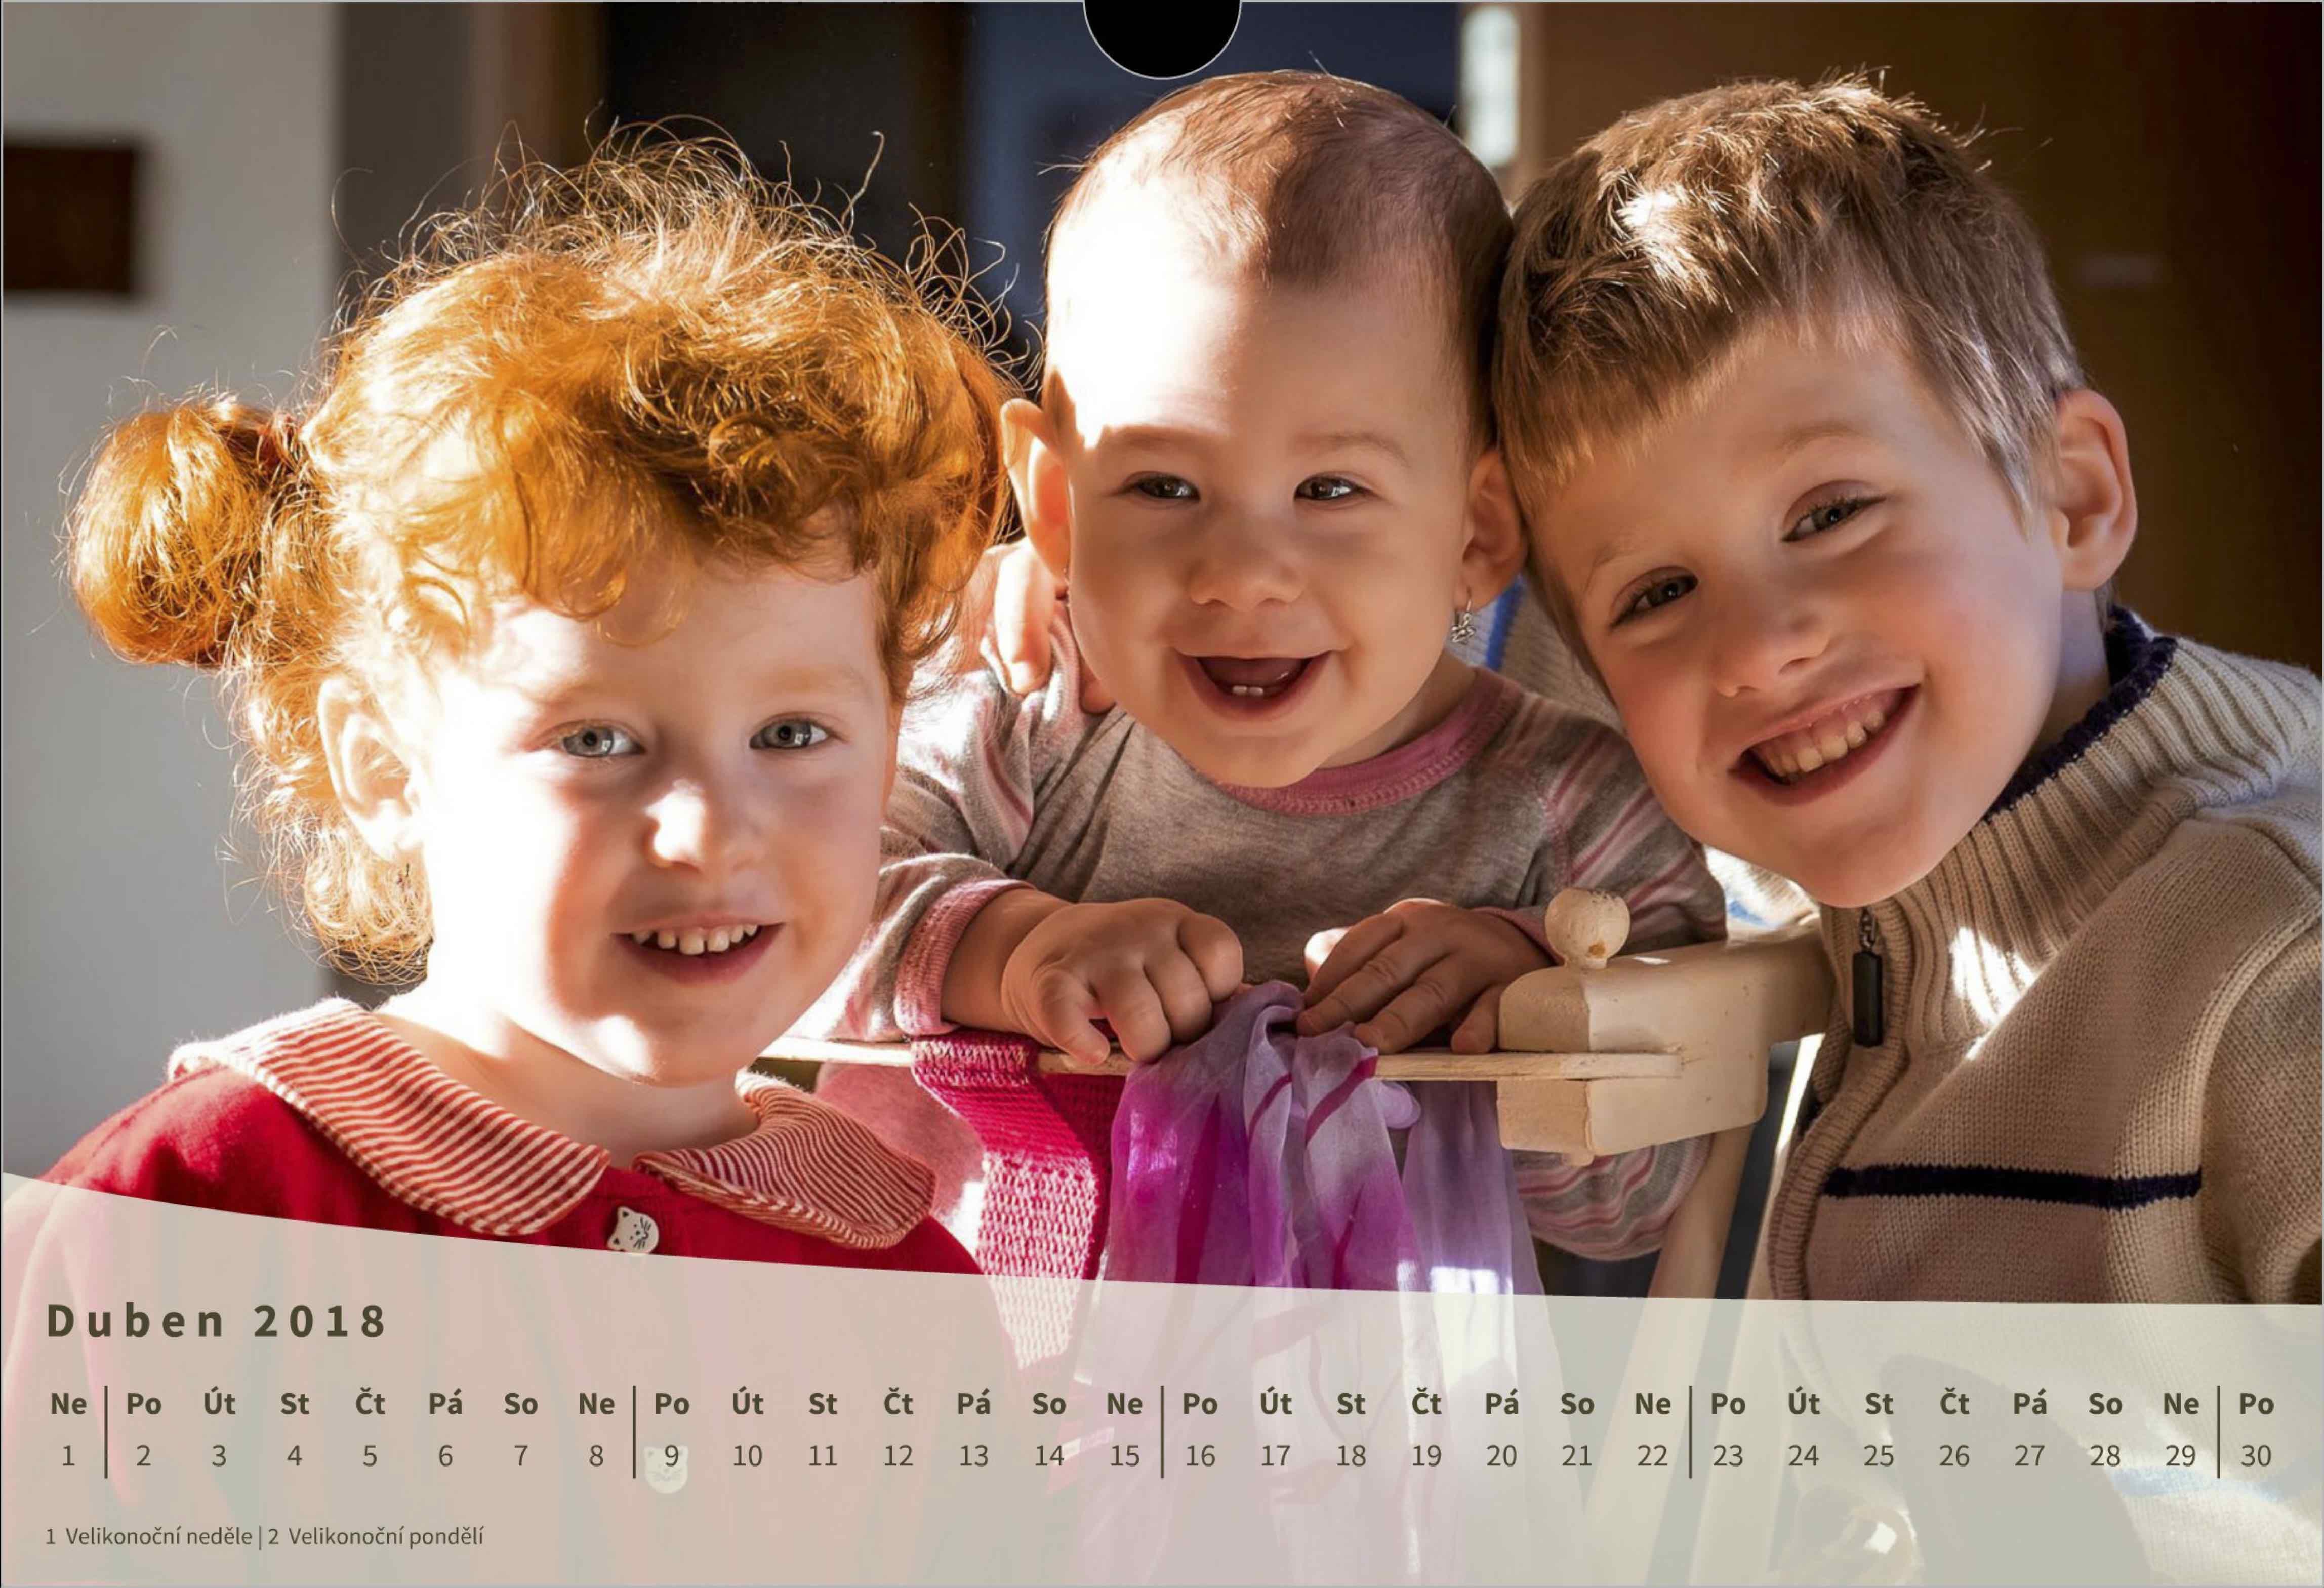 Rodinný kalendář z originálních fotografií - fotograf Vysočina, Brno, Praha - www.originalfoto.cz